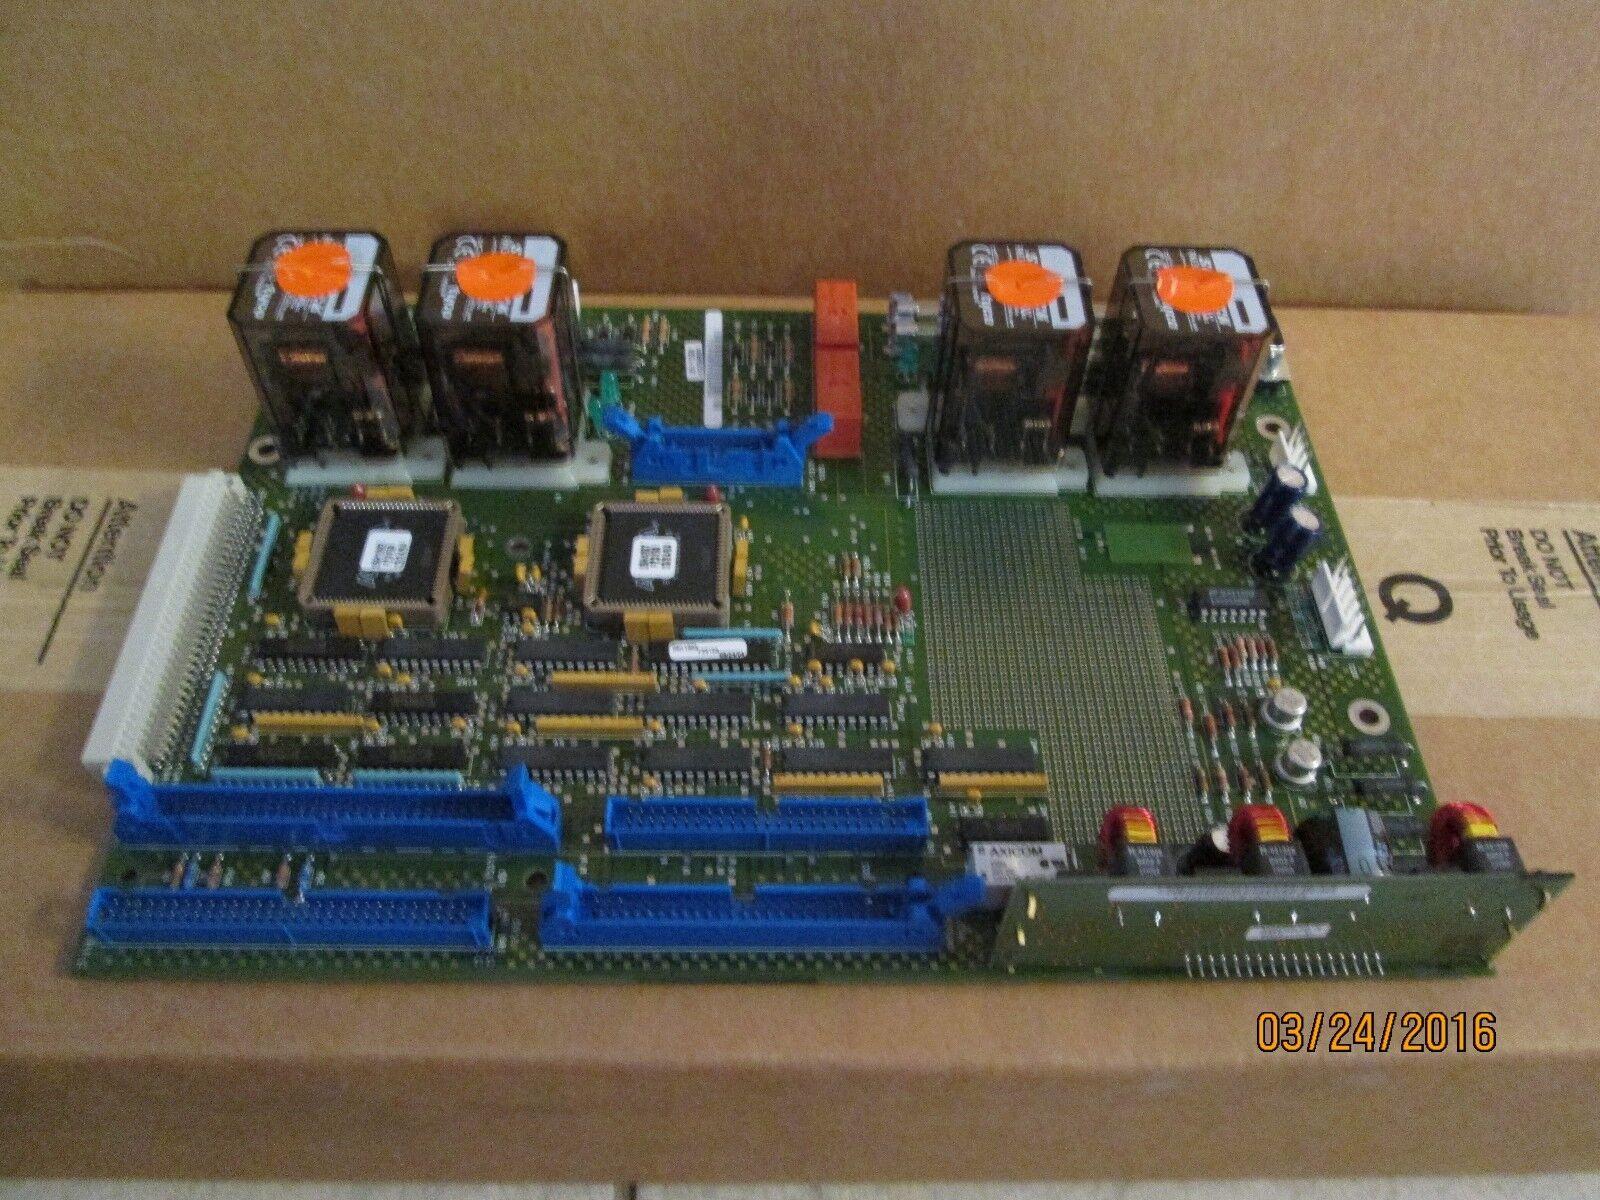 GENUINE IBM 3494 MACHINE INTERFACE CARD - 19P4960